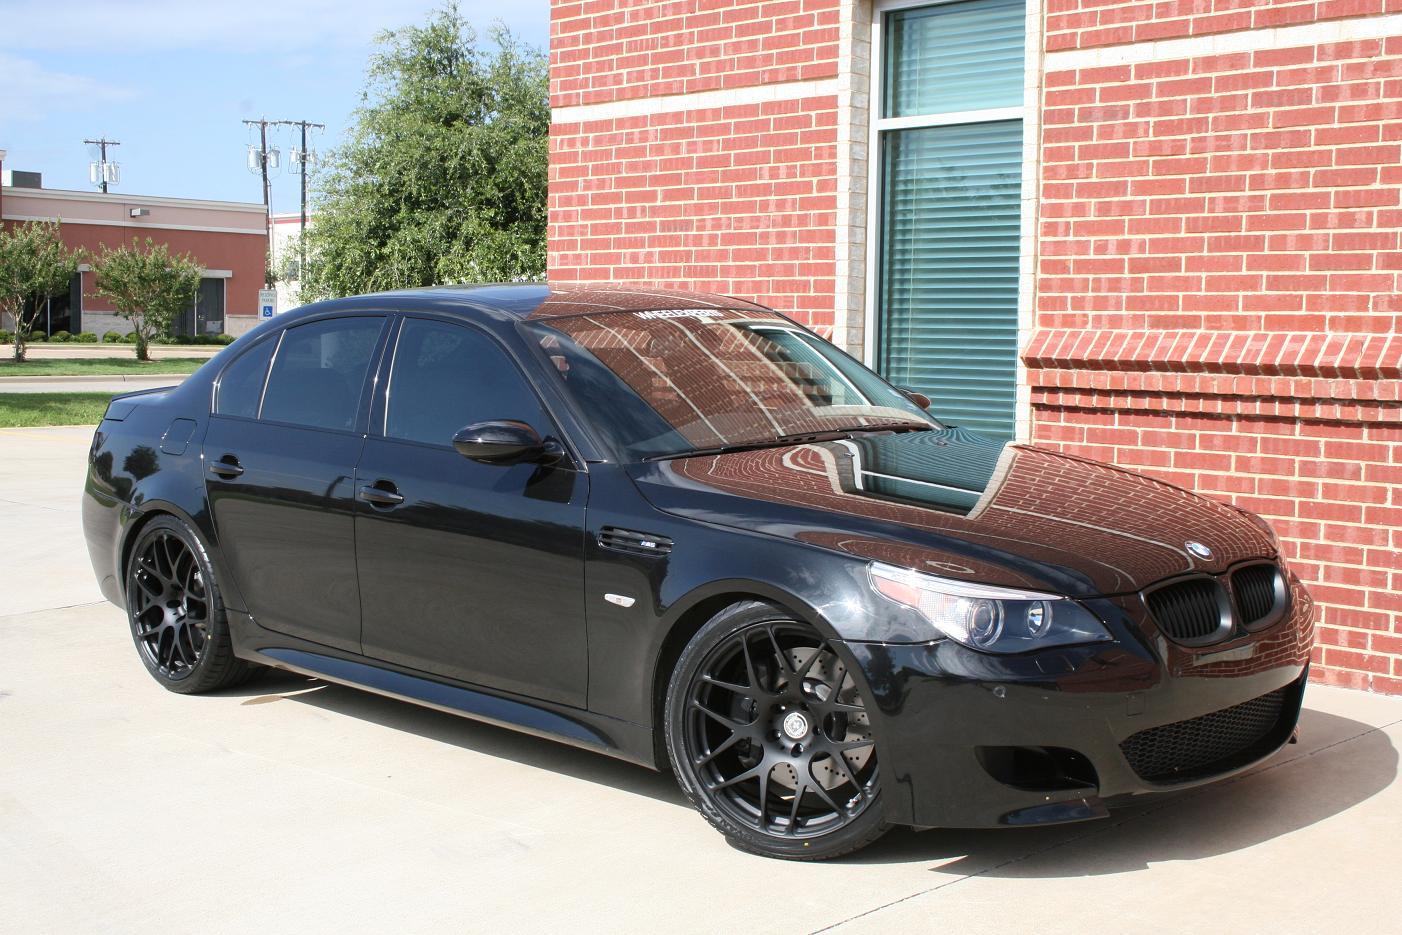 Black E60 W Black Wheels In San Antonio Bmw M5 Forum And M6 Forums